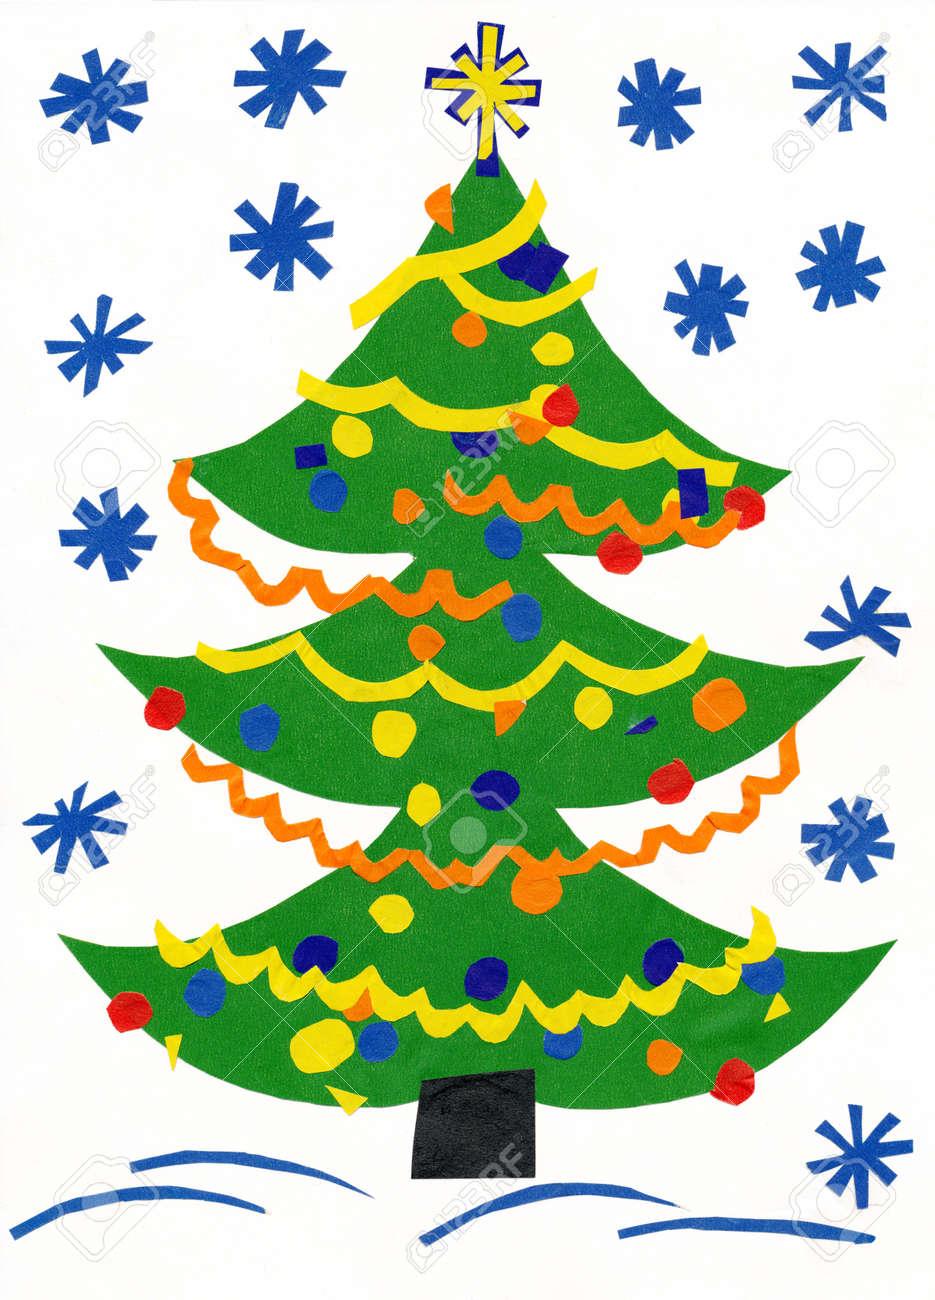 Christmas Tree Cutout.Christmas Tree Children Paper Cutout